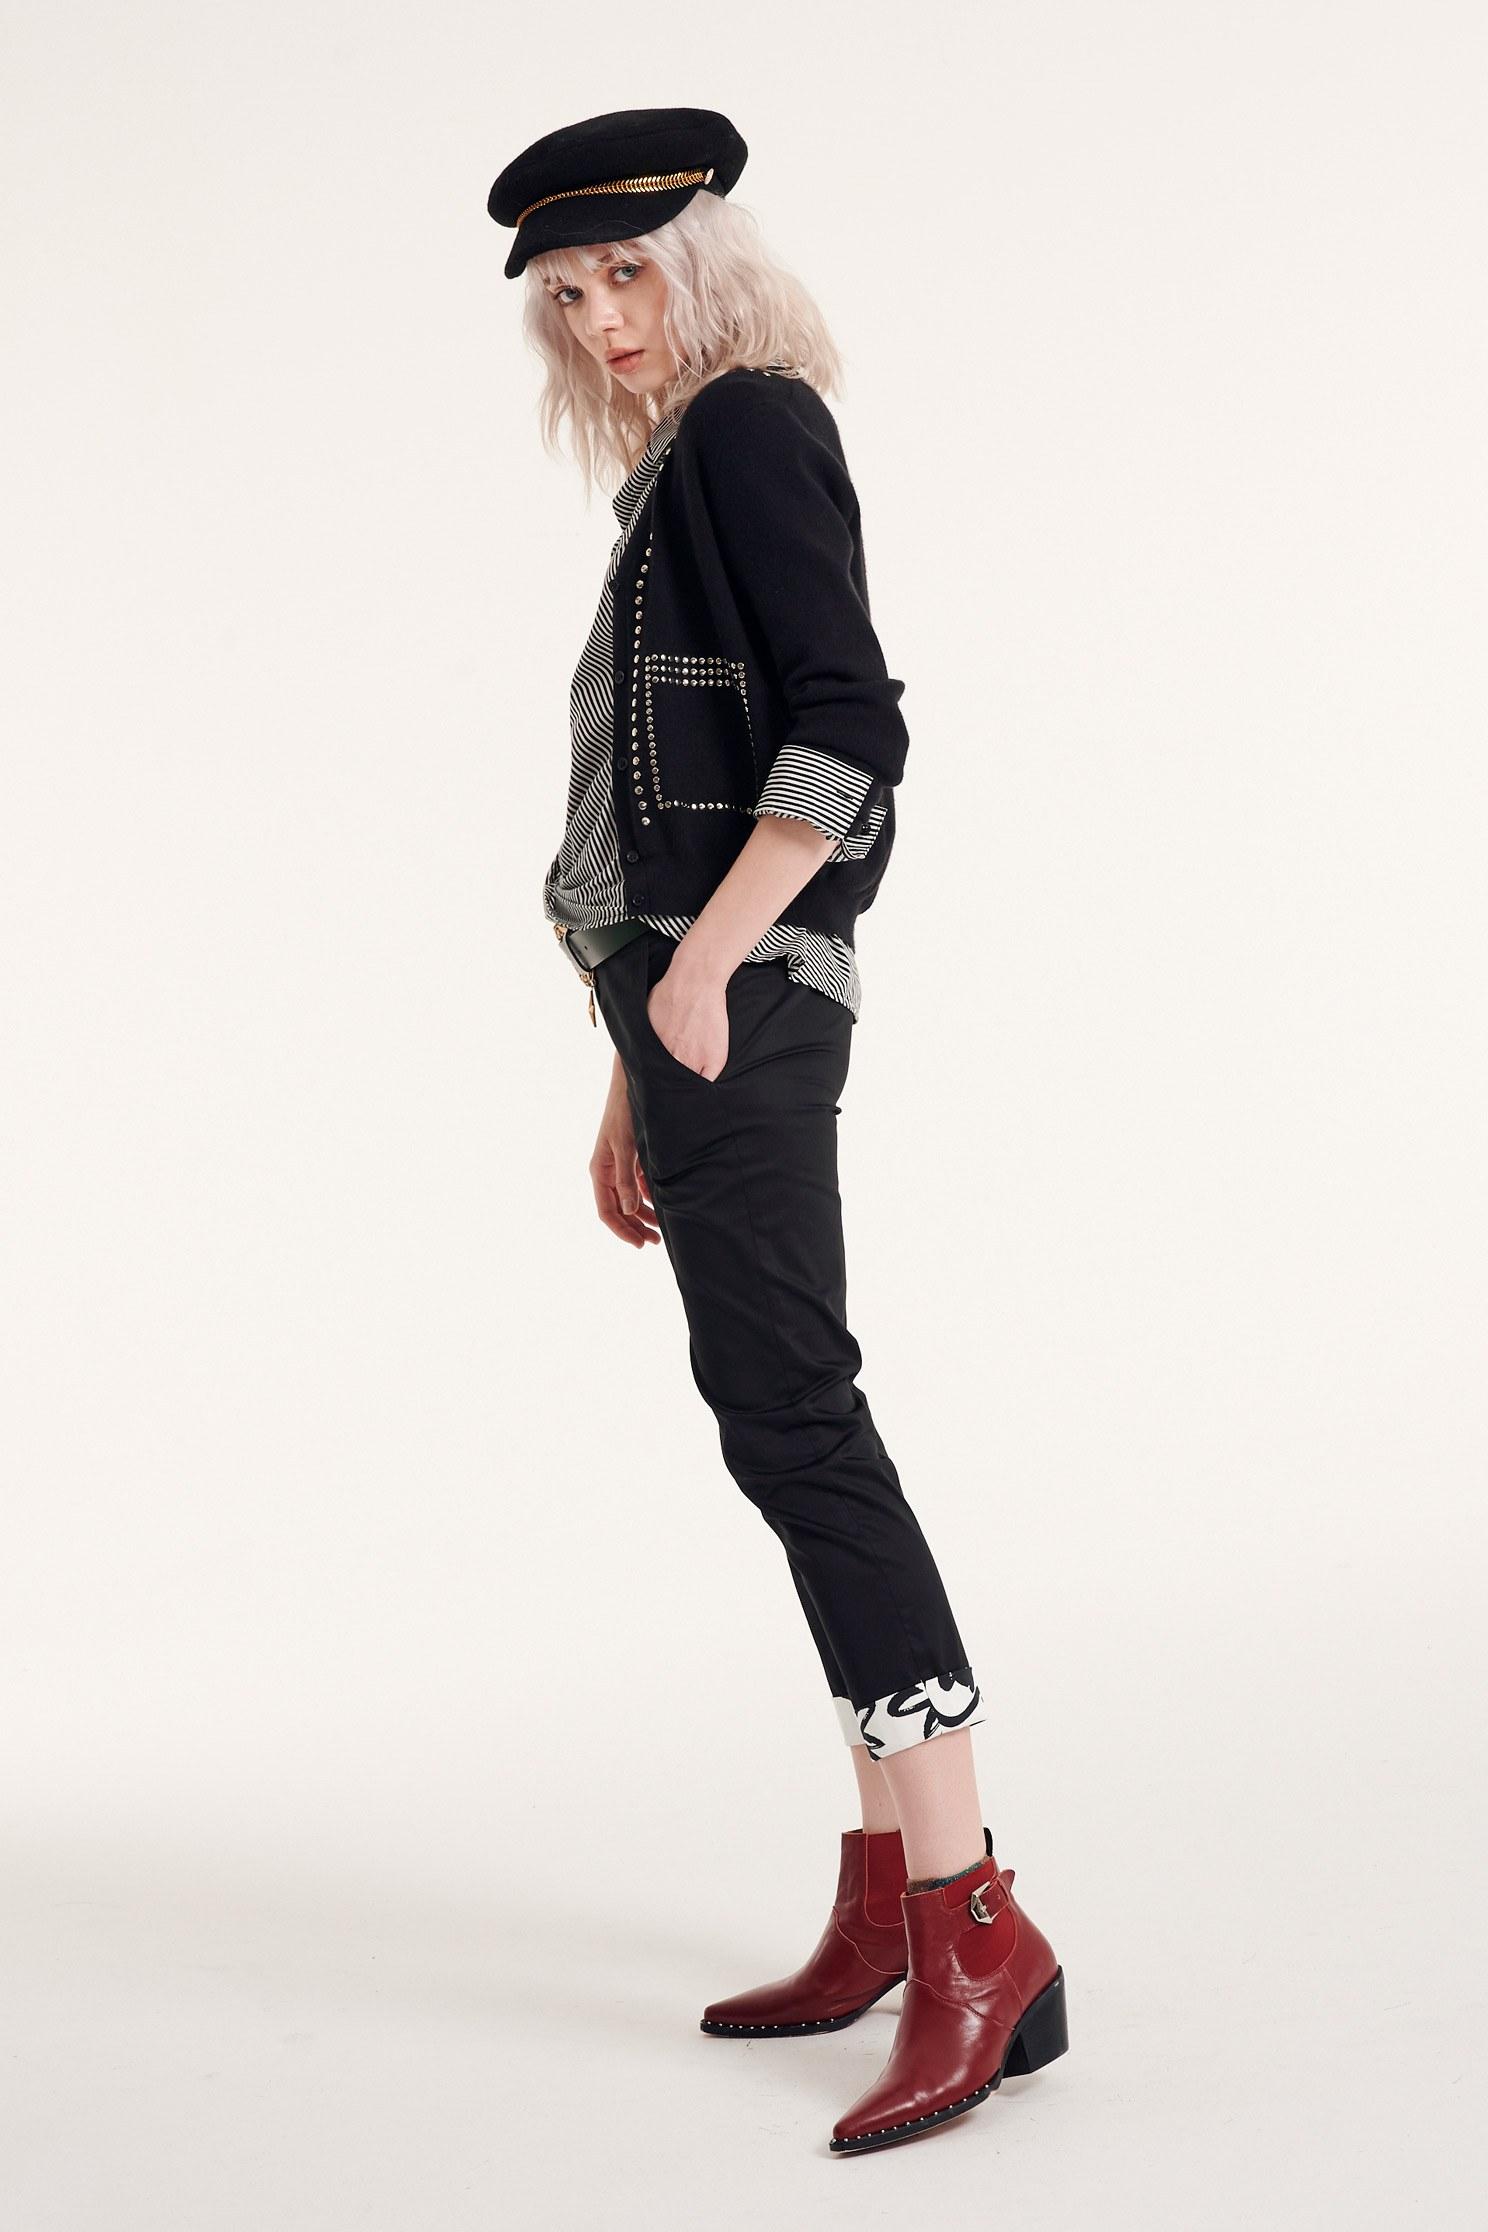 Back-fold printed trousers,Season (AW) Look,pants,Turn-up pants,Pants,Slim pants,Black pants,Black pants